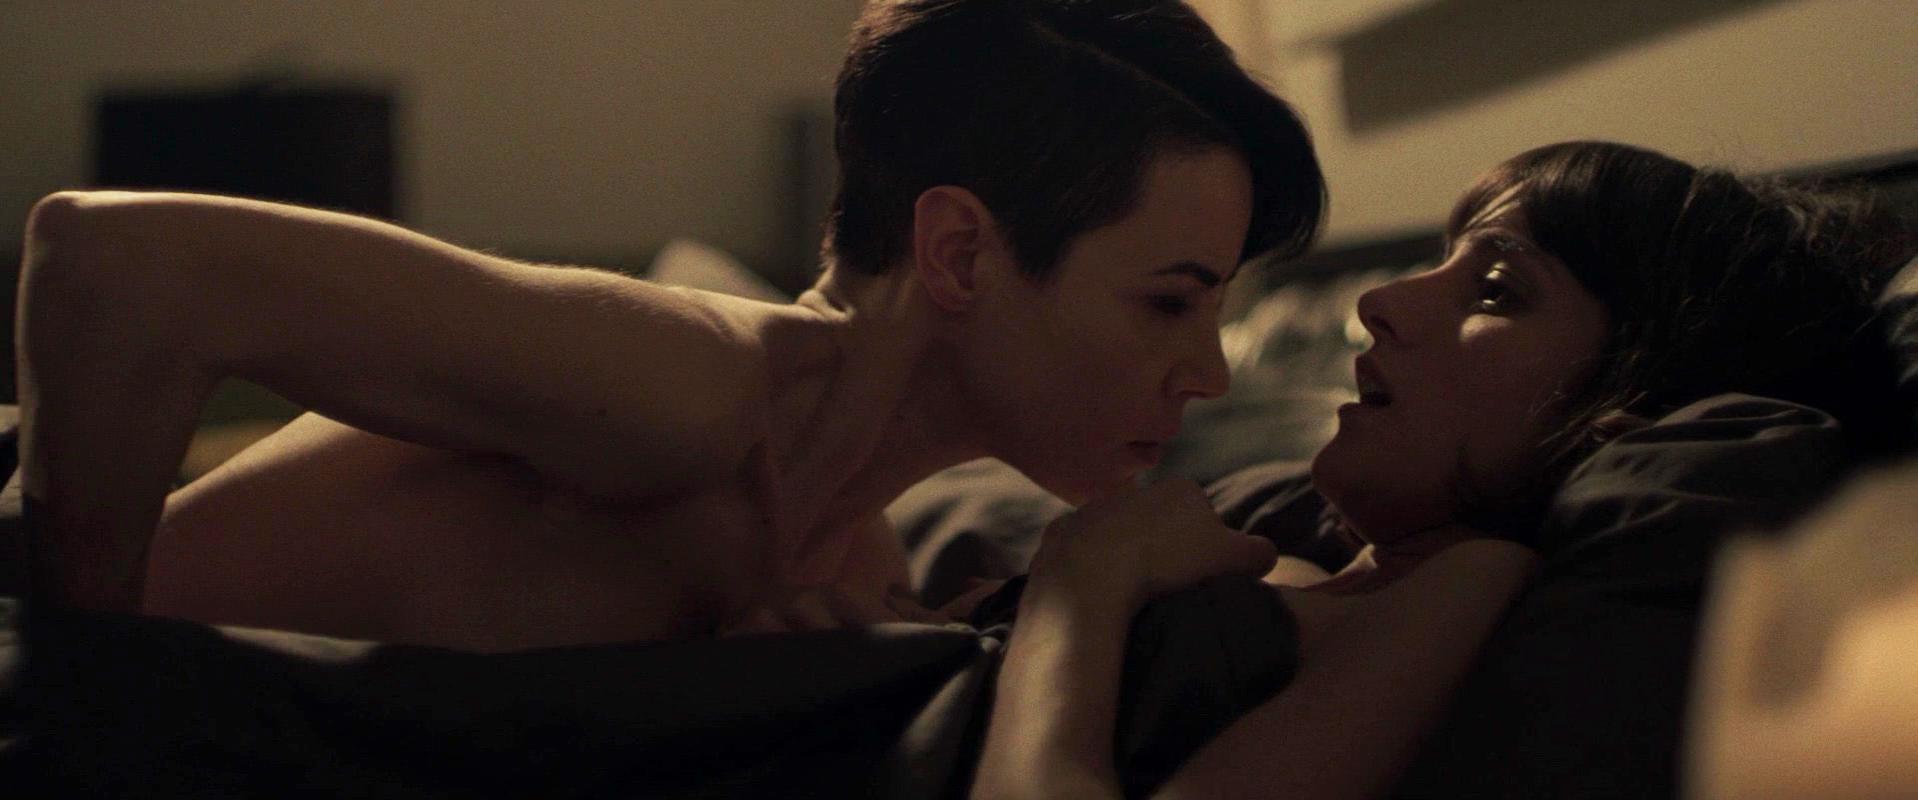 Francesca Agostini nude, Alessia Navarro nude - Hope Lost (2015)